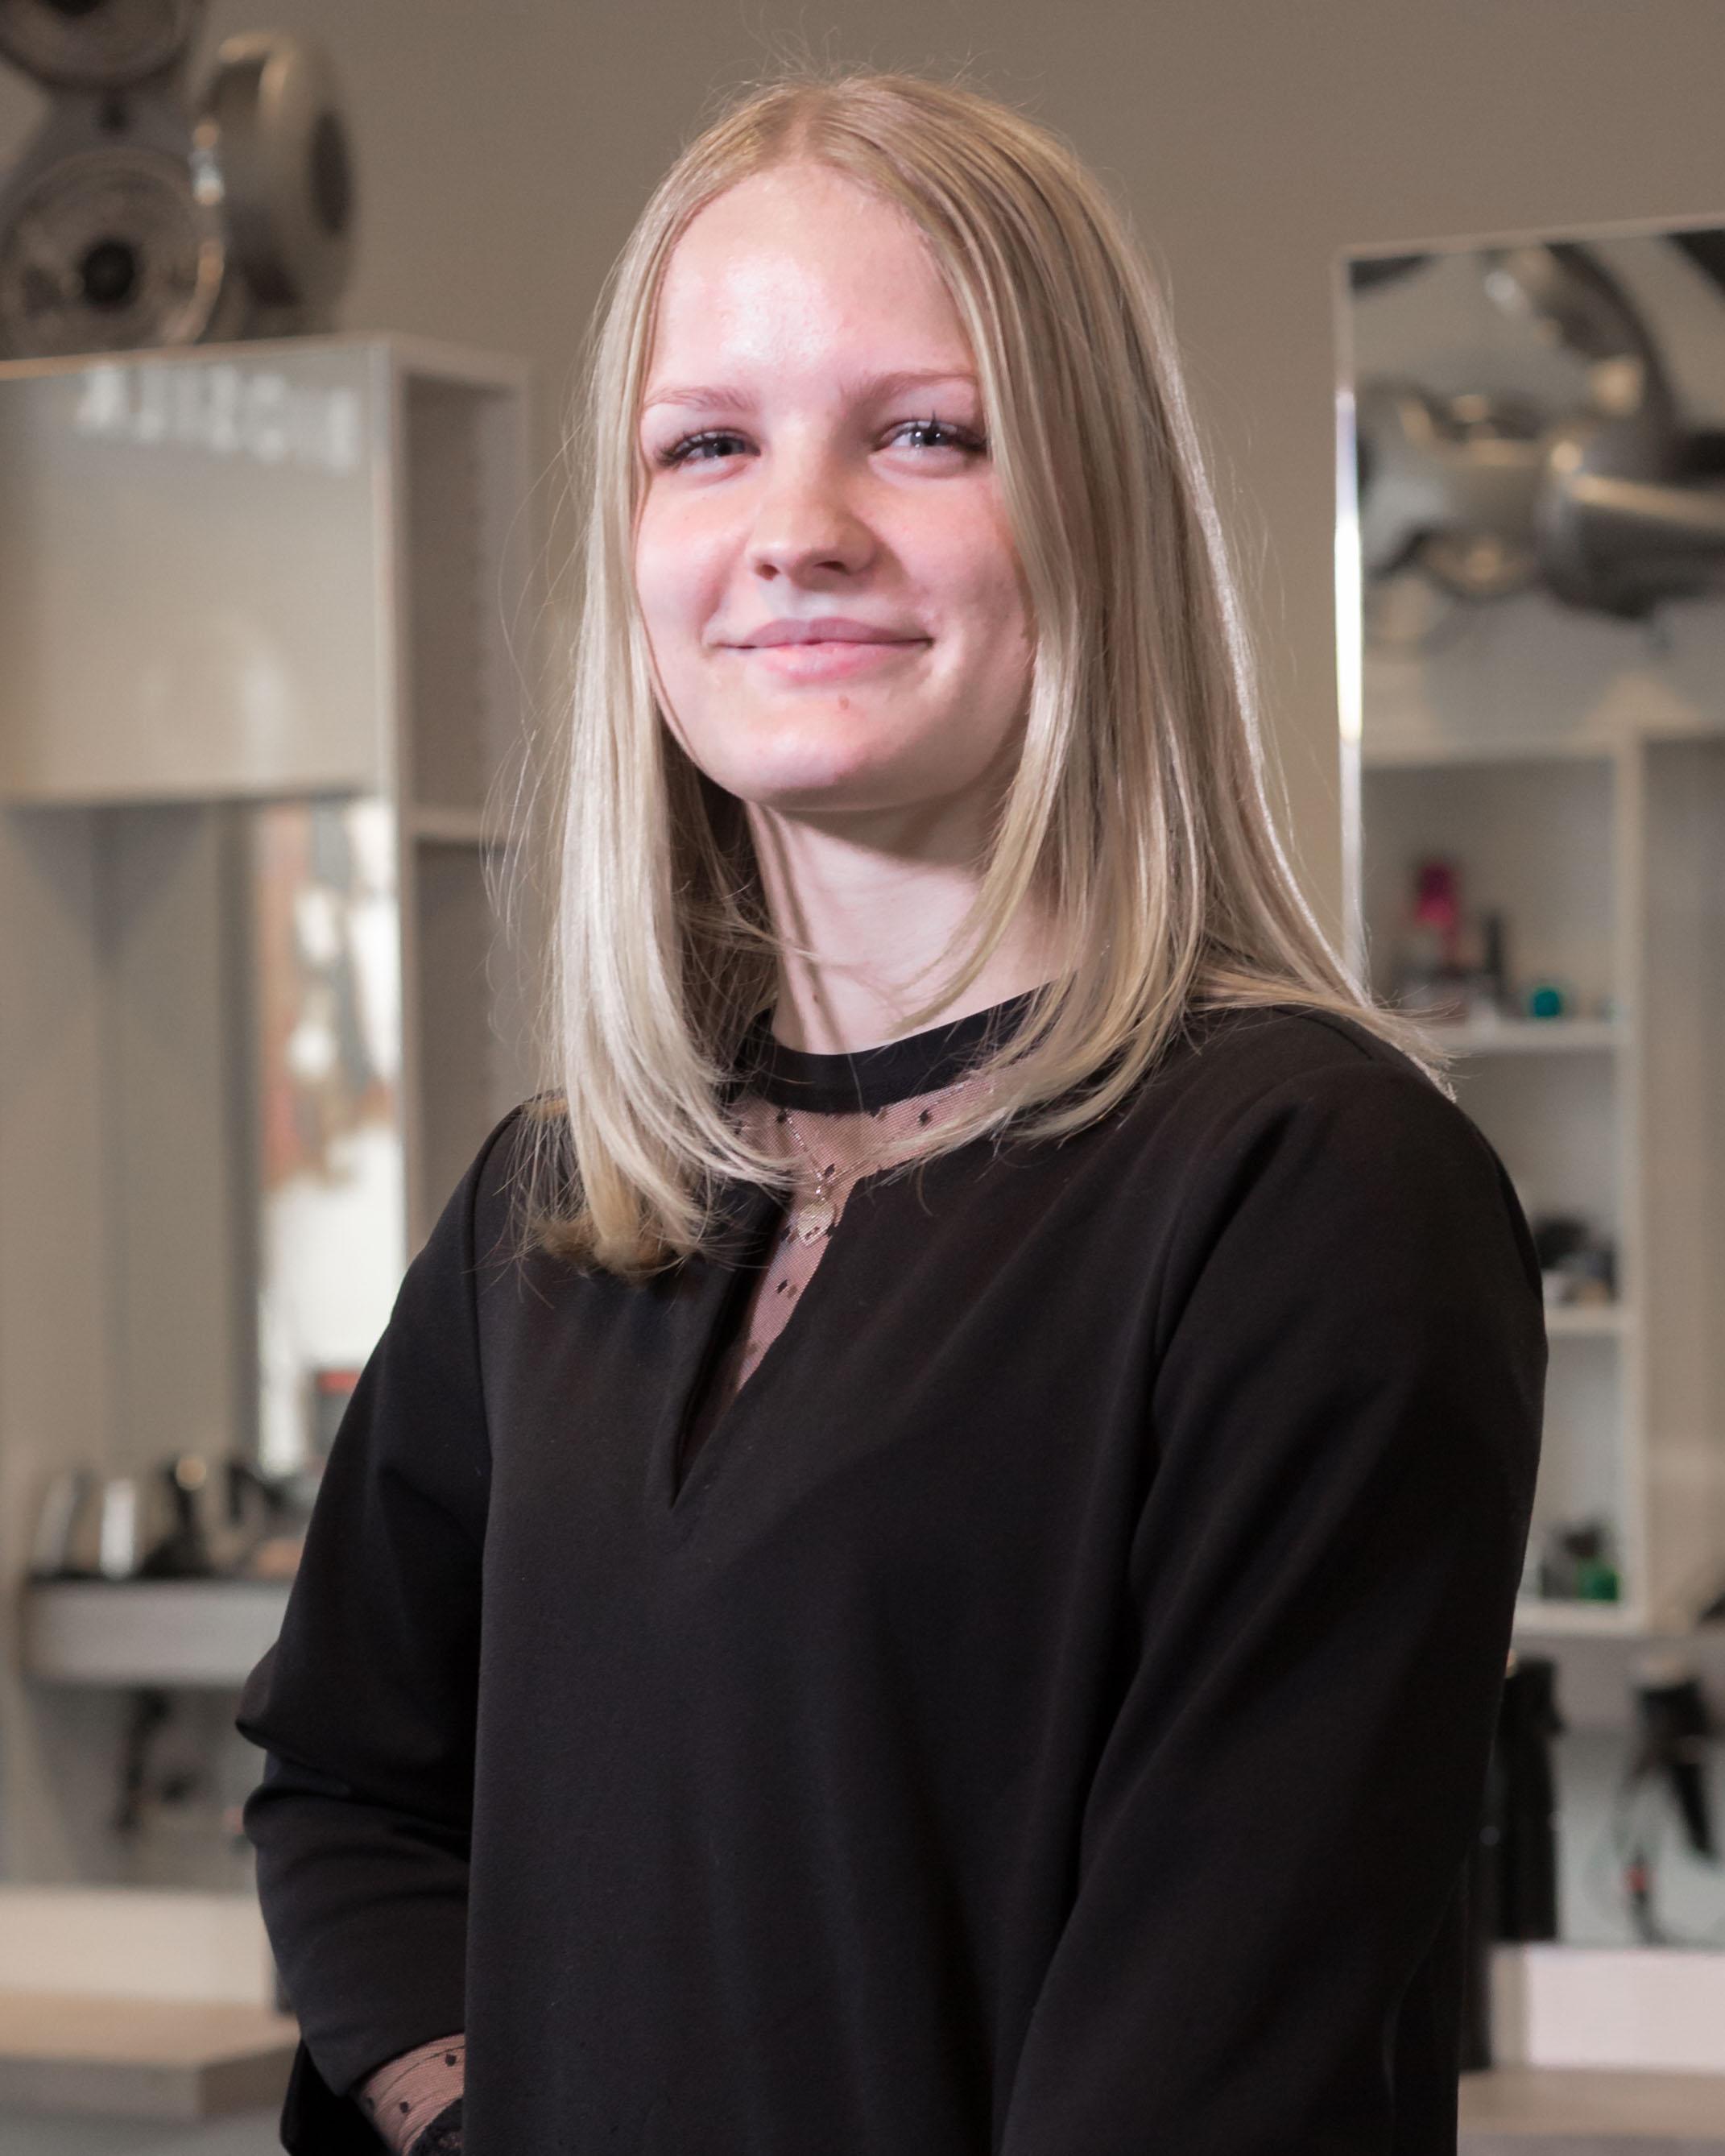 Nikki - Kapper bij Hairstyling Hélène Stellendam